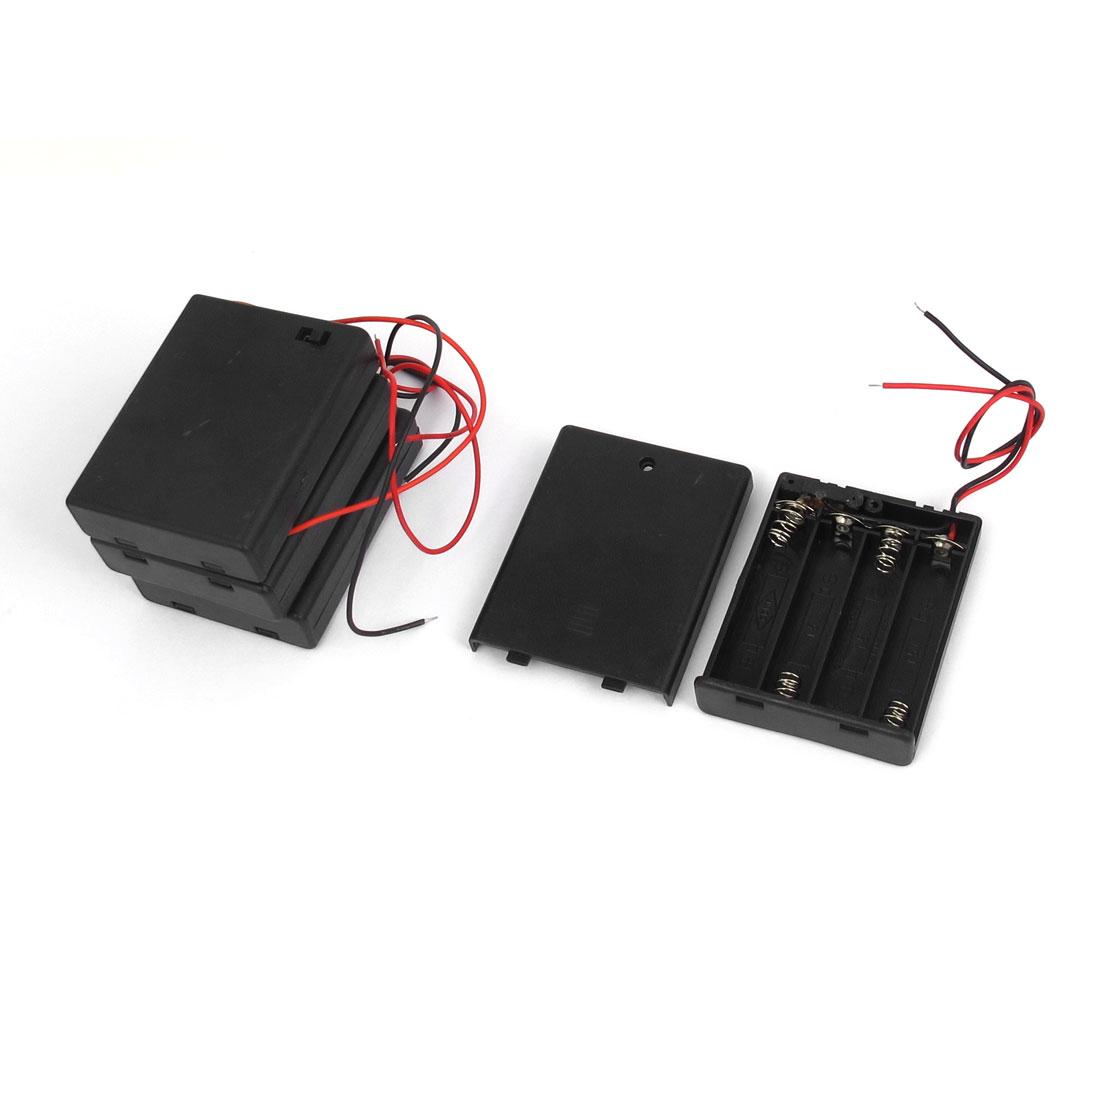 Plastic Housing 4 x 1.5V AA Battery Holder Storage Case Box ON/OFF Switch Black 4pcs